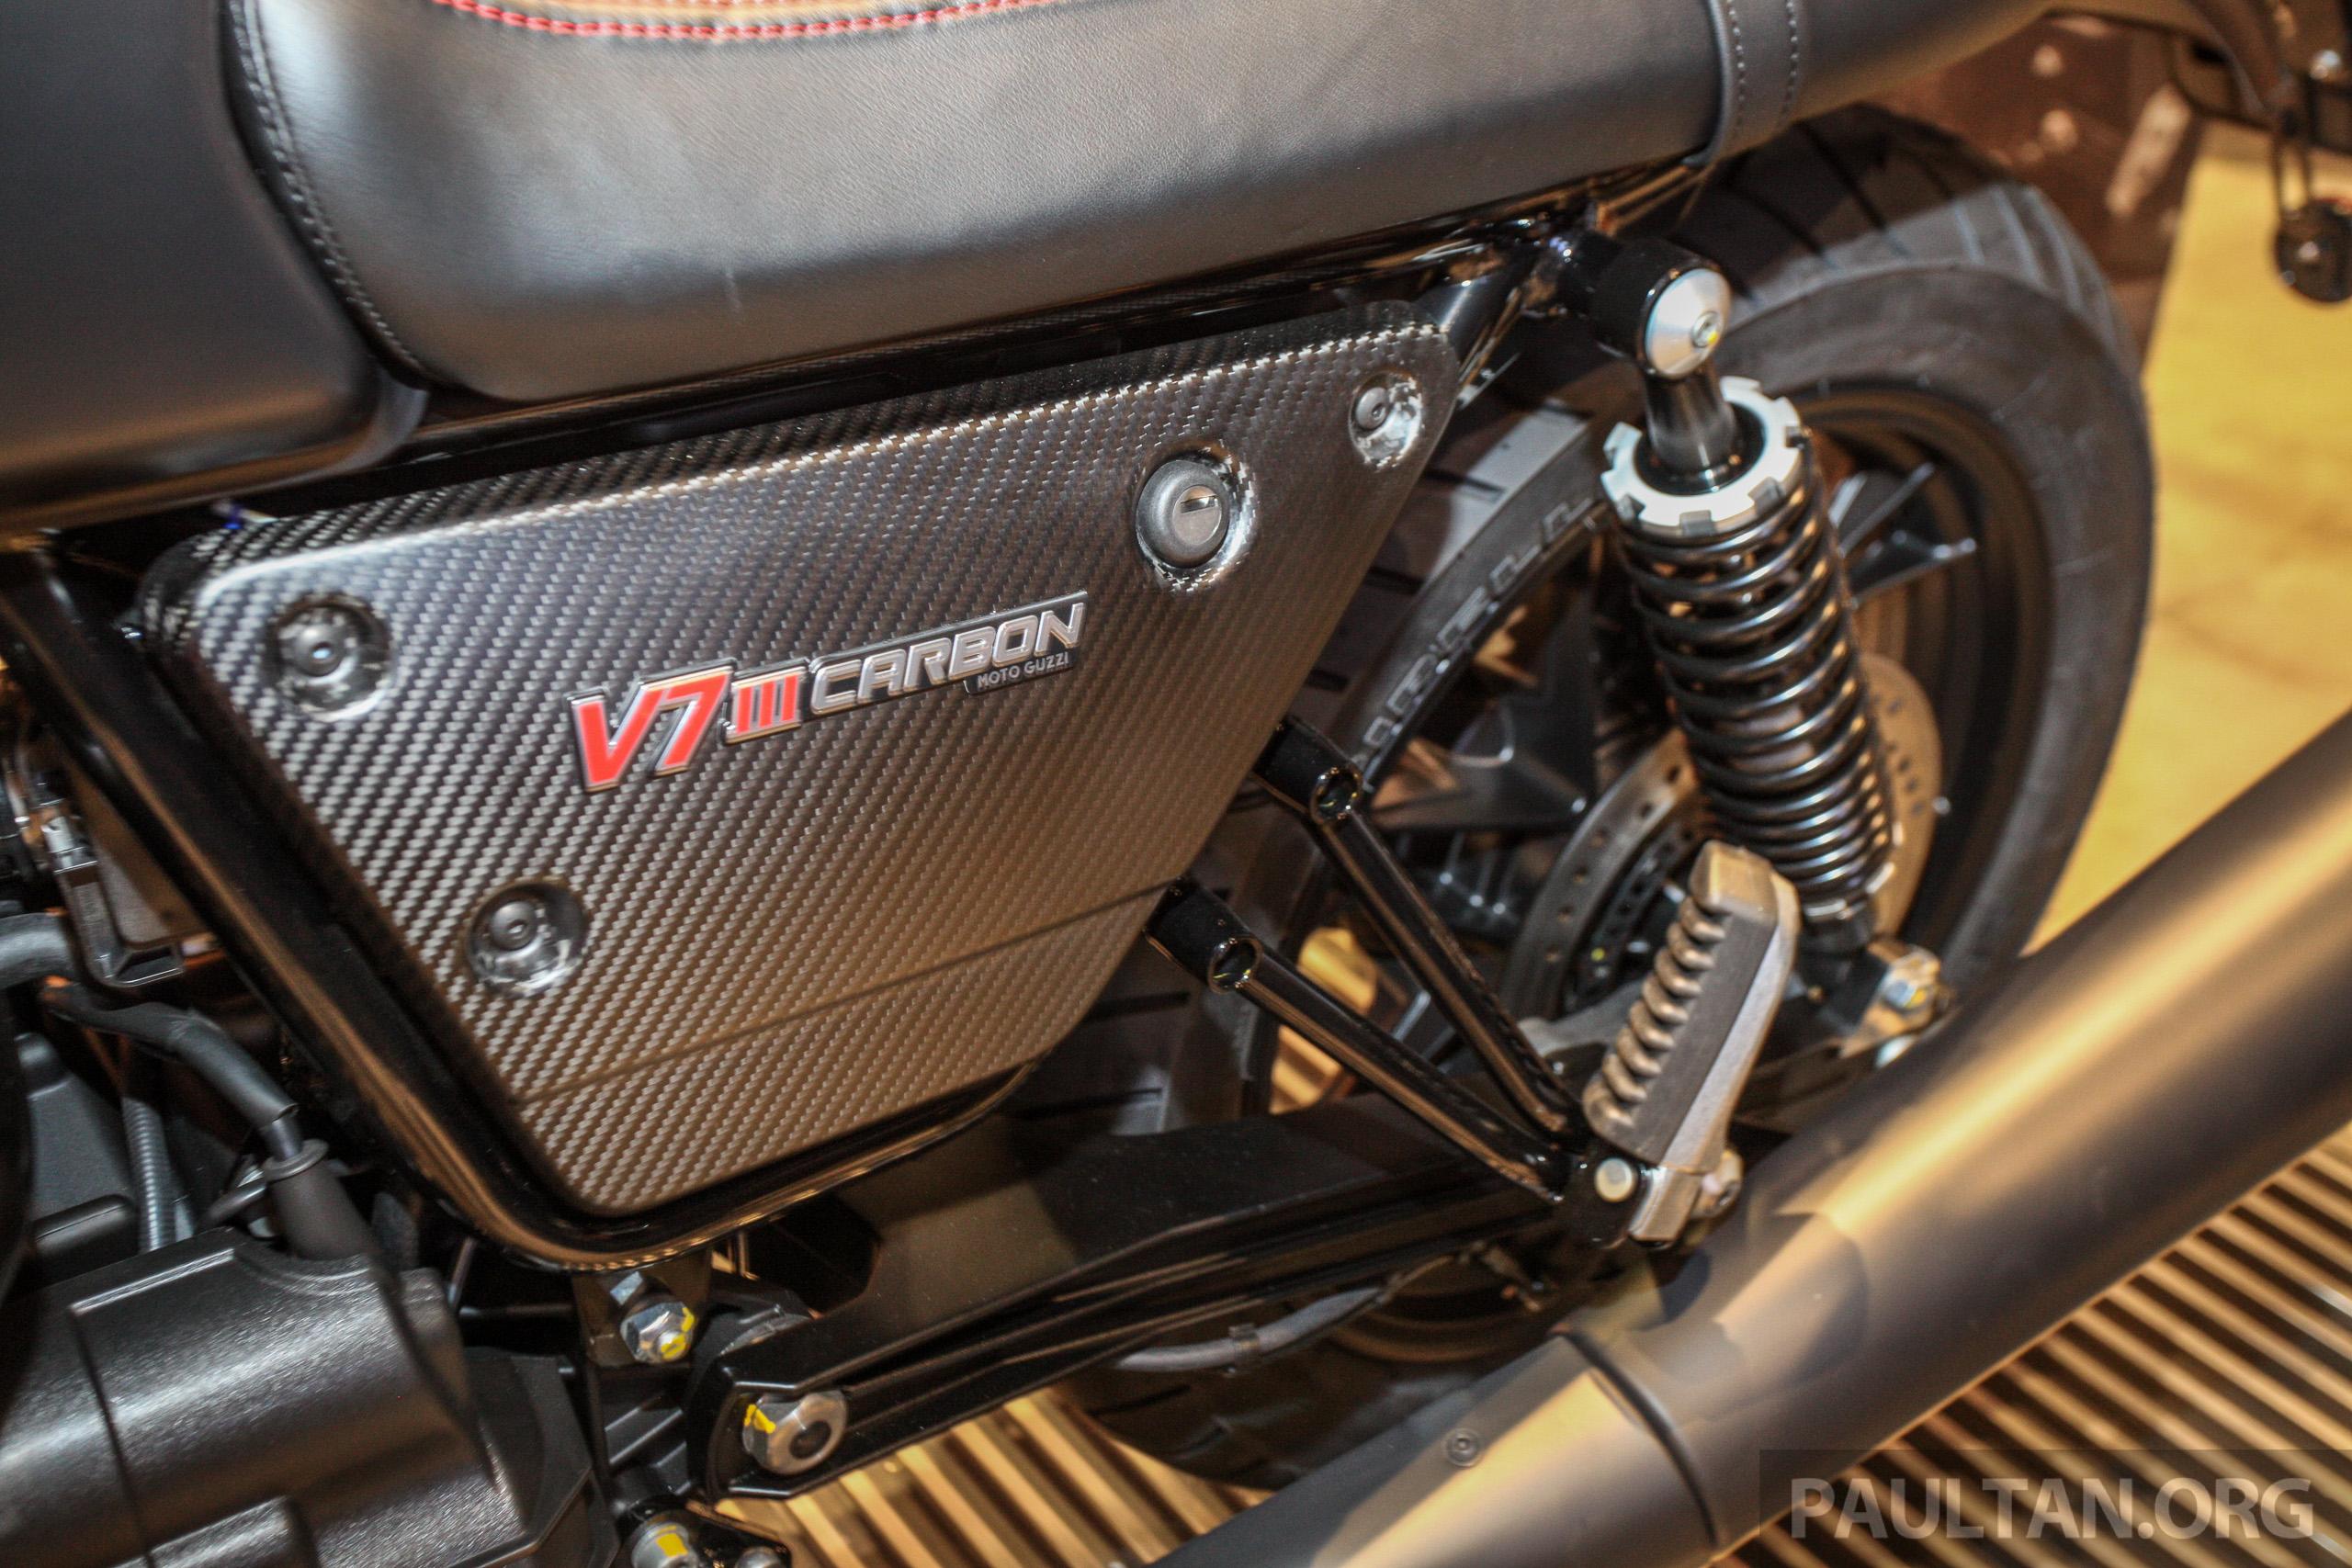 2018 Moto Guzzi V7 Iii Carbon In Malaysia Rm74900 Paul Tan